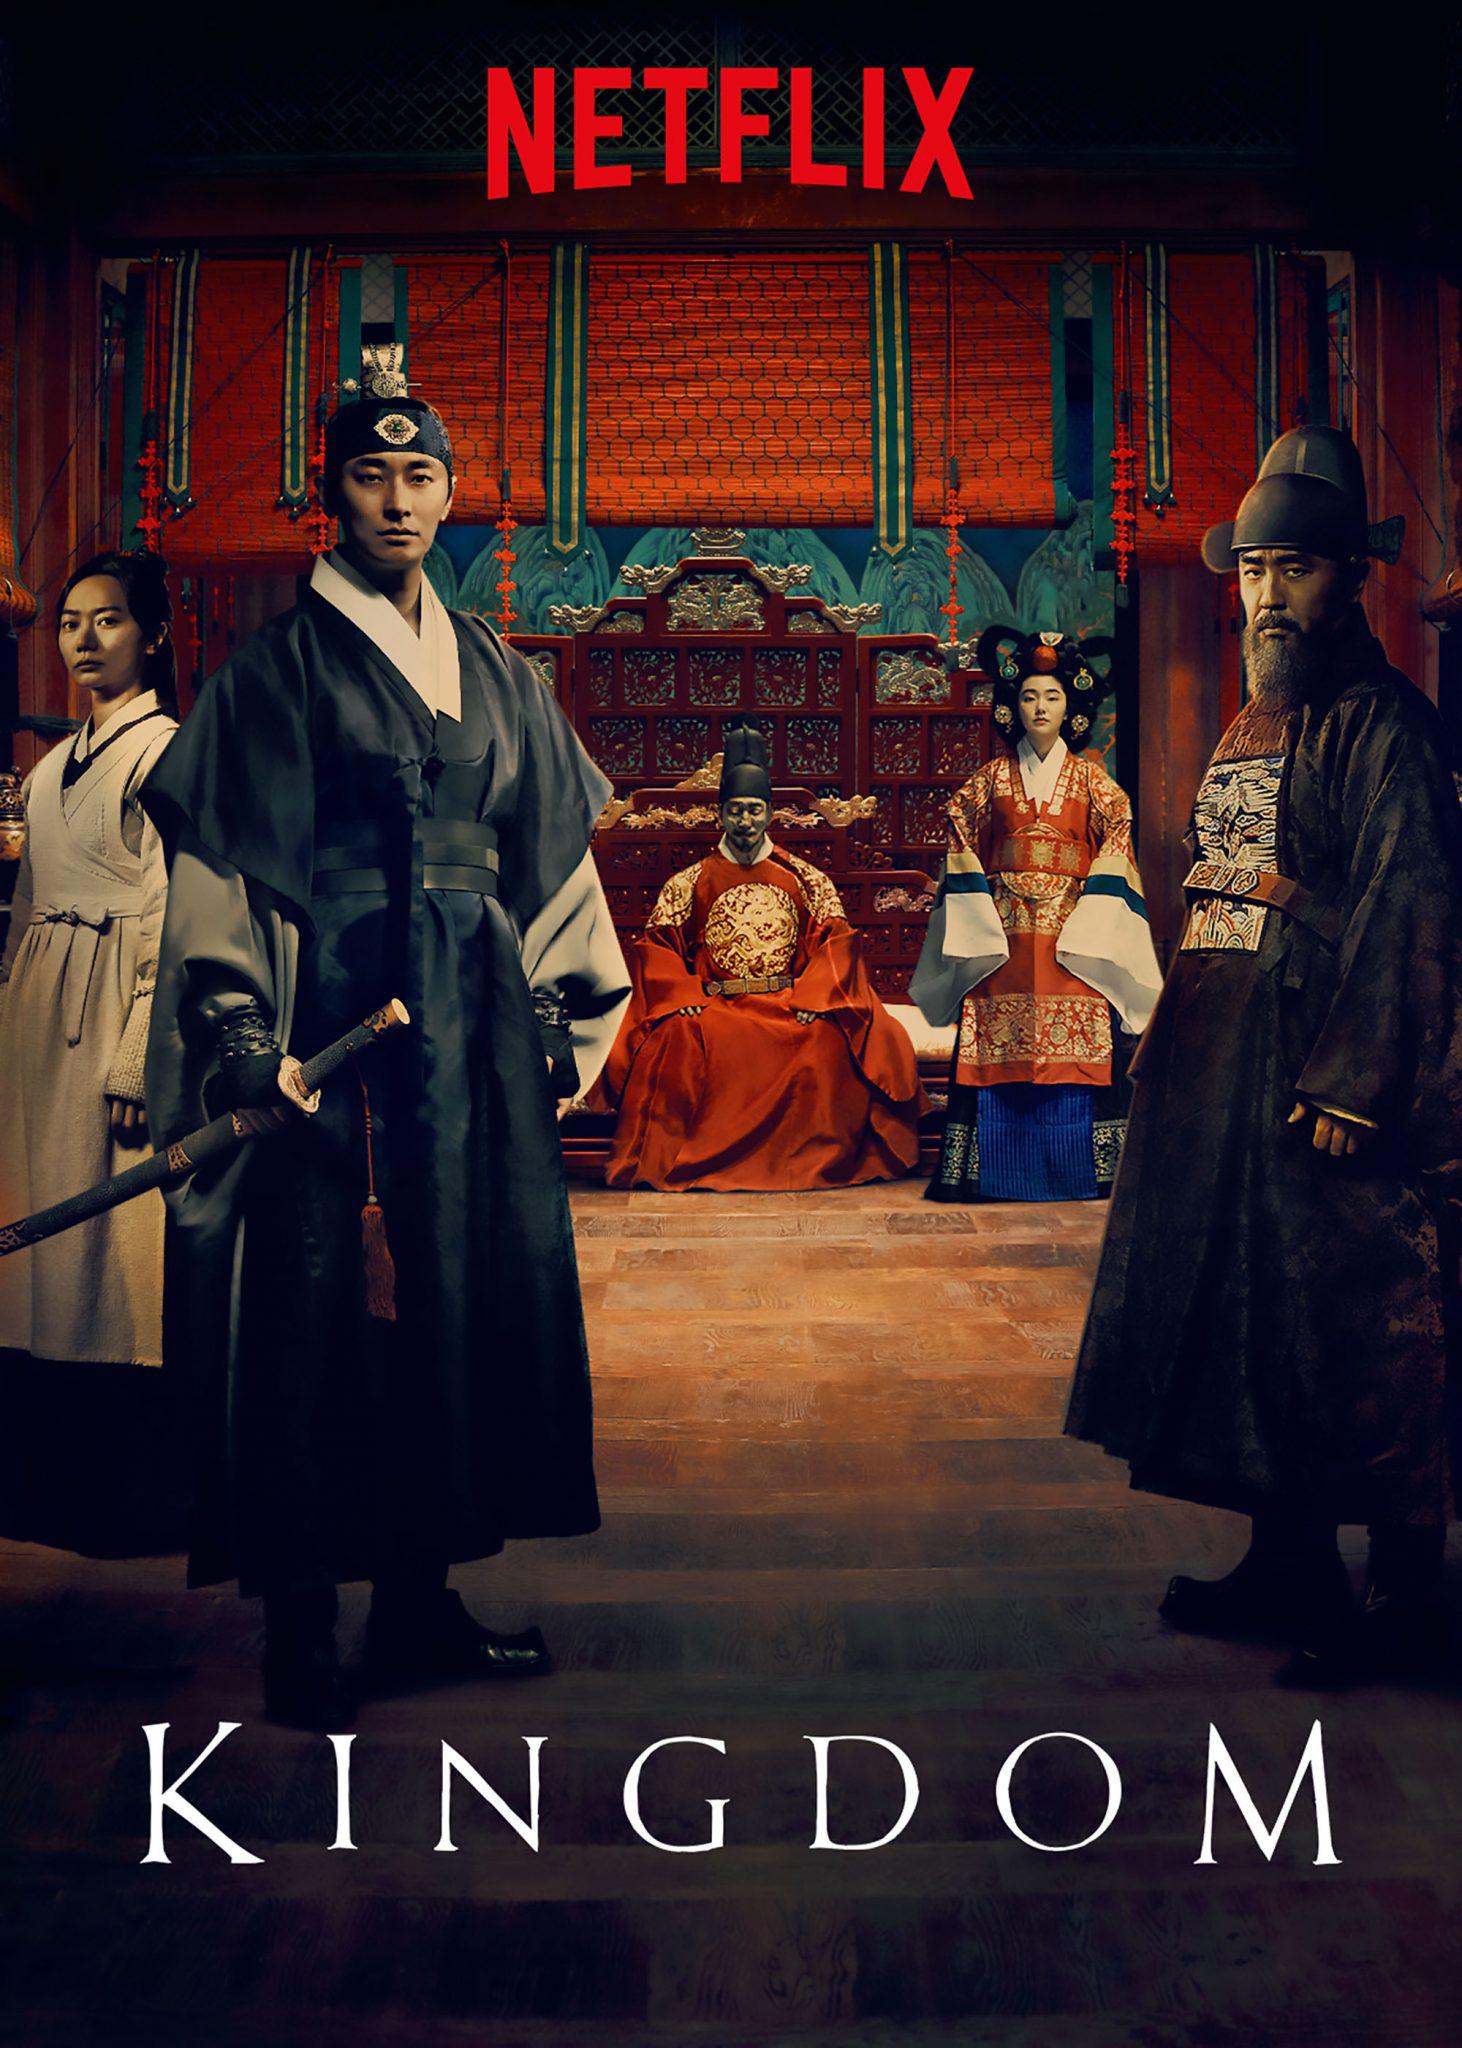 Kingdom (2019 TV series) | Netflix Kingdom: Kami no Kuni ...